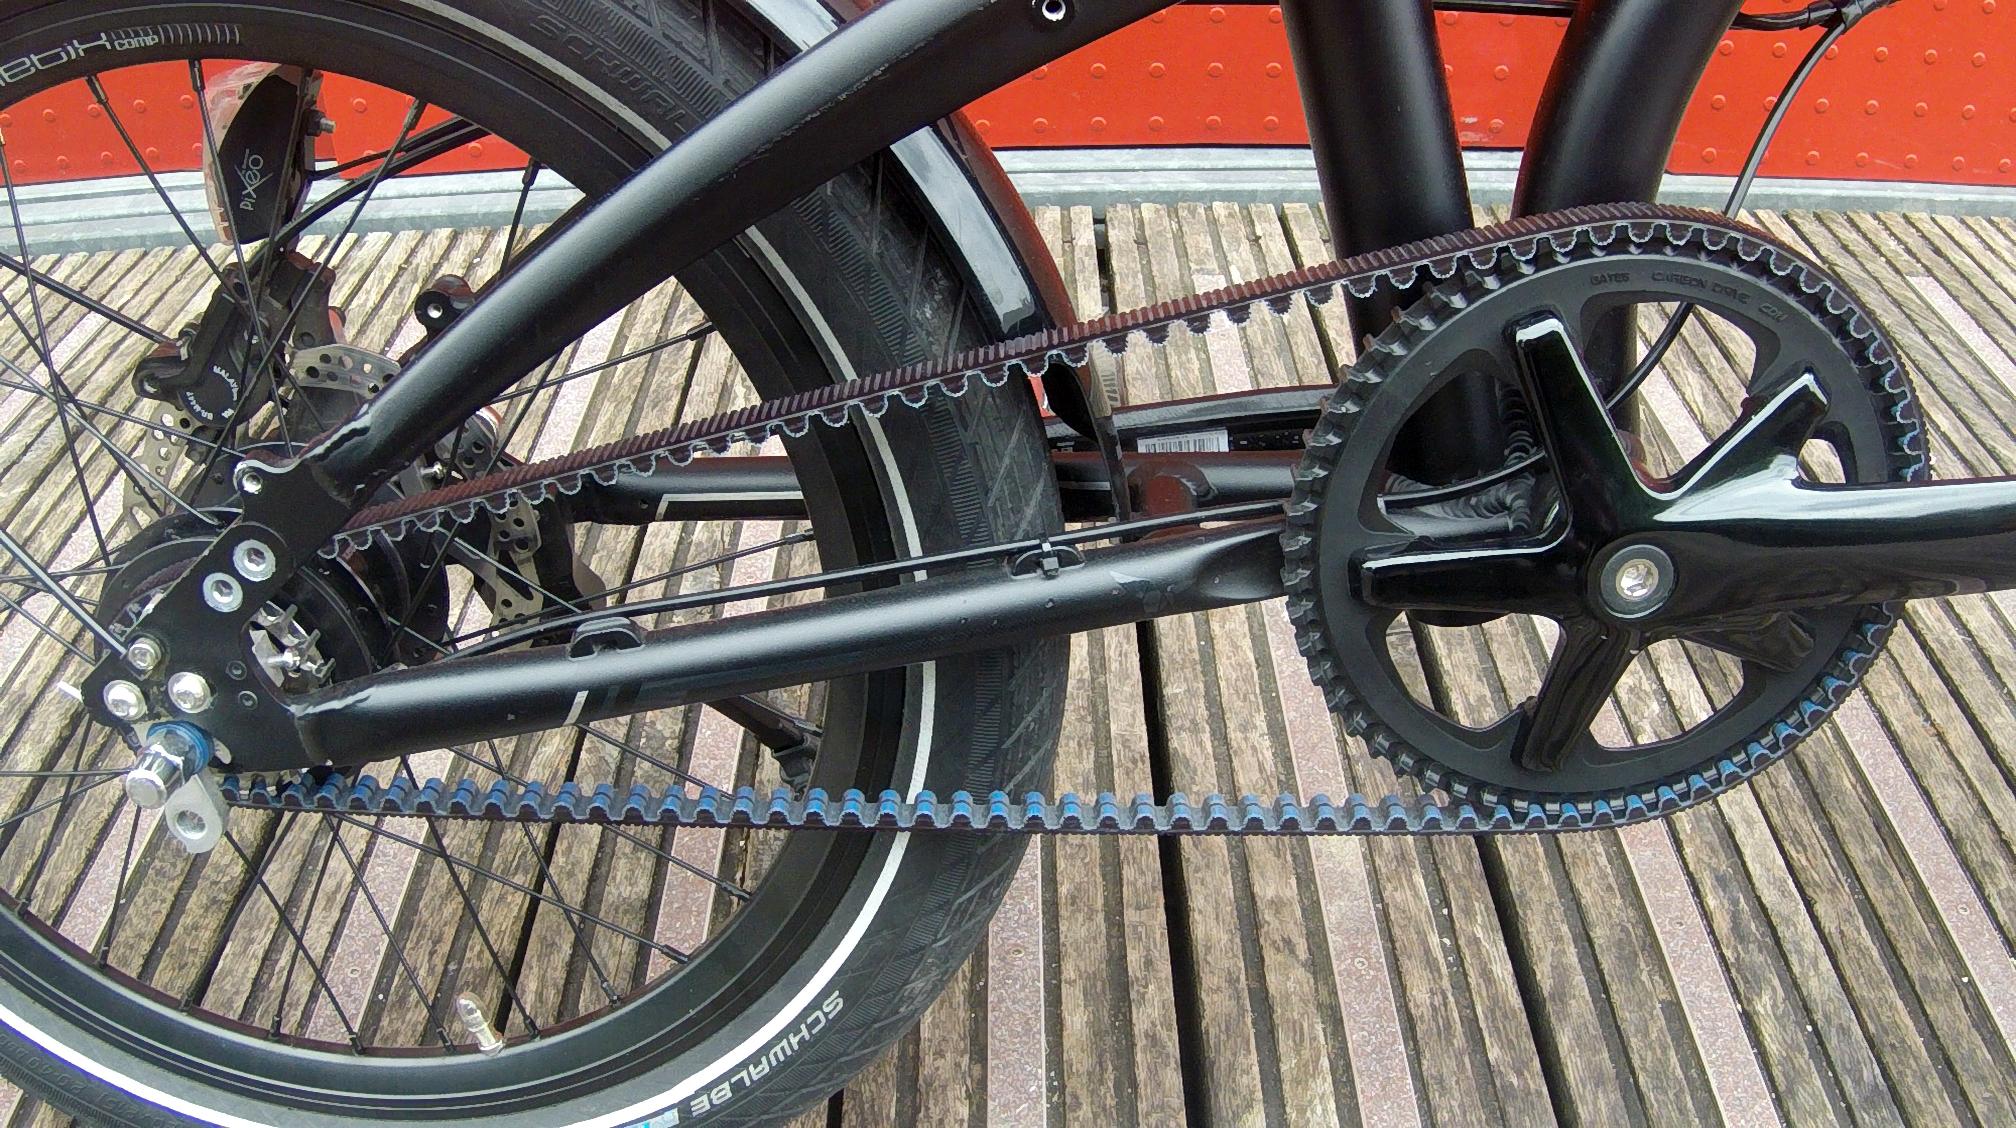 Vélo pliant haut de gamme Tern Verge S8i